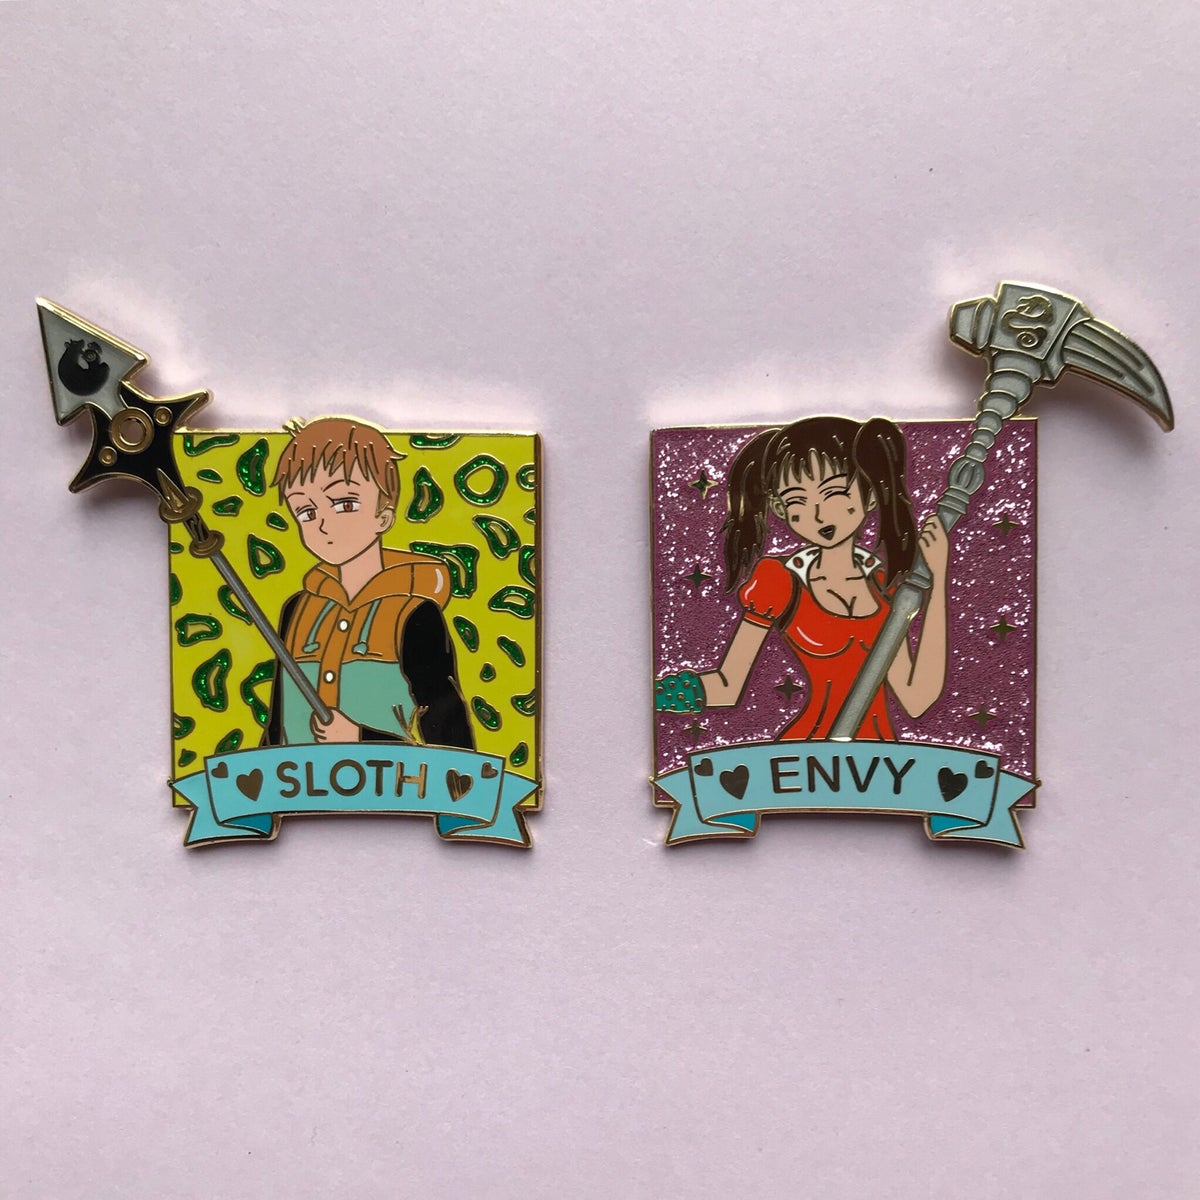 Image of Envy & Sloth